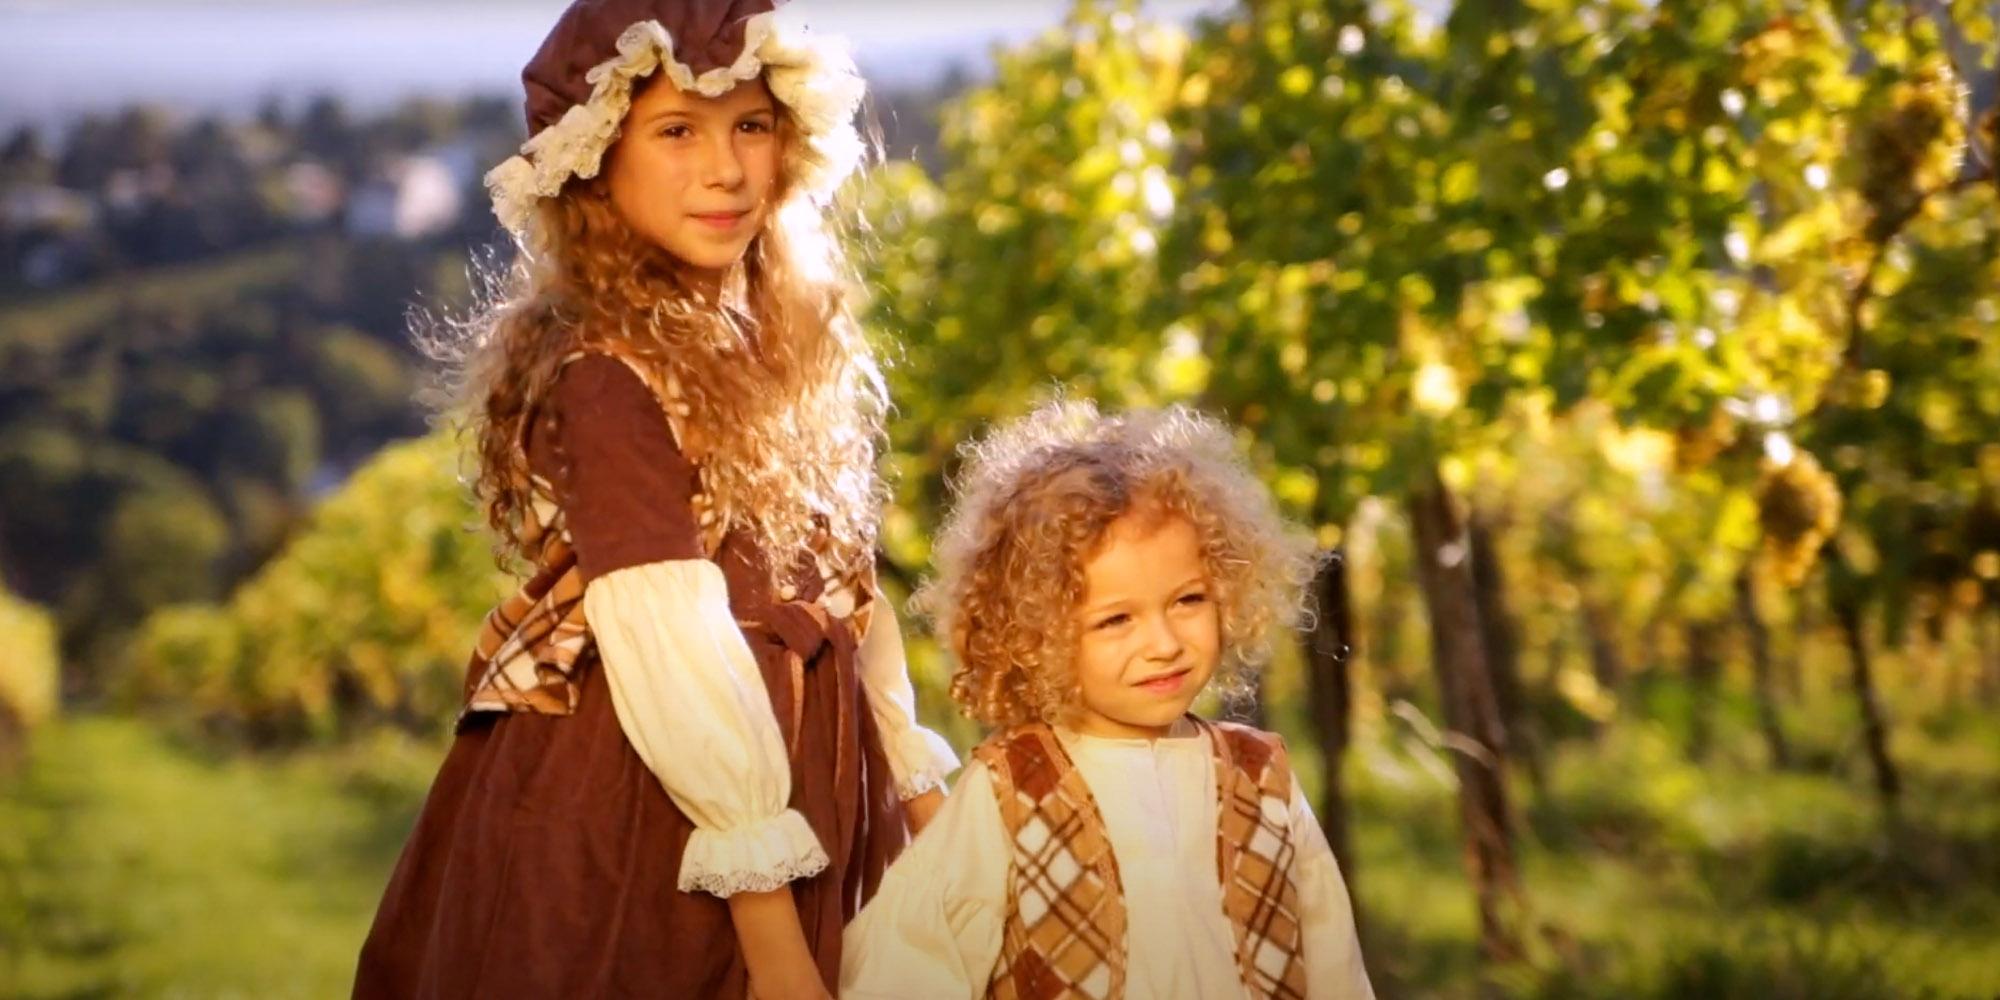 Two kids in vineyard